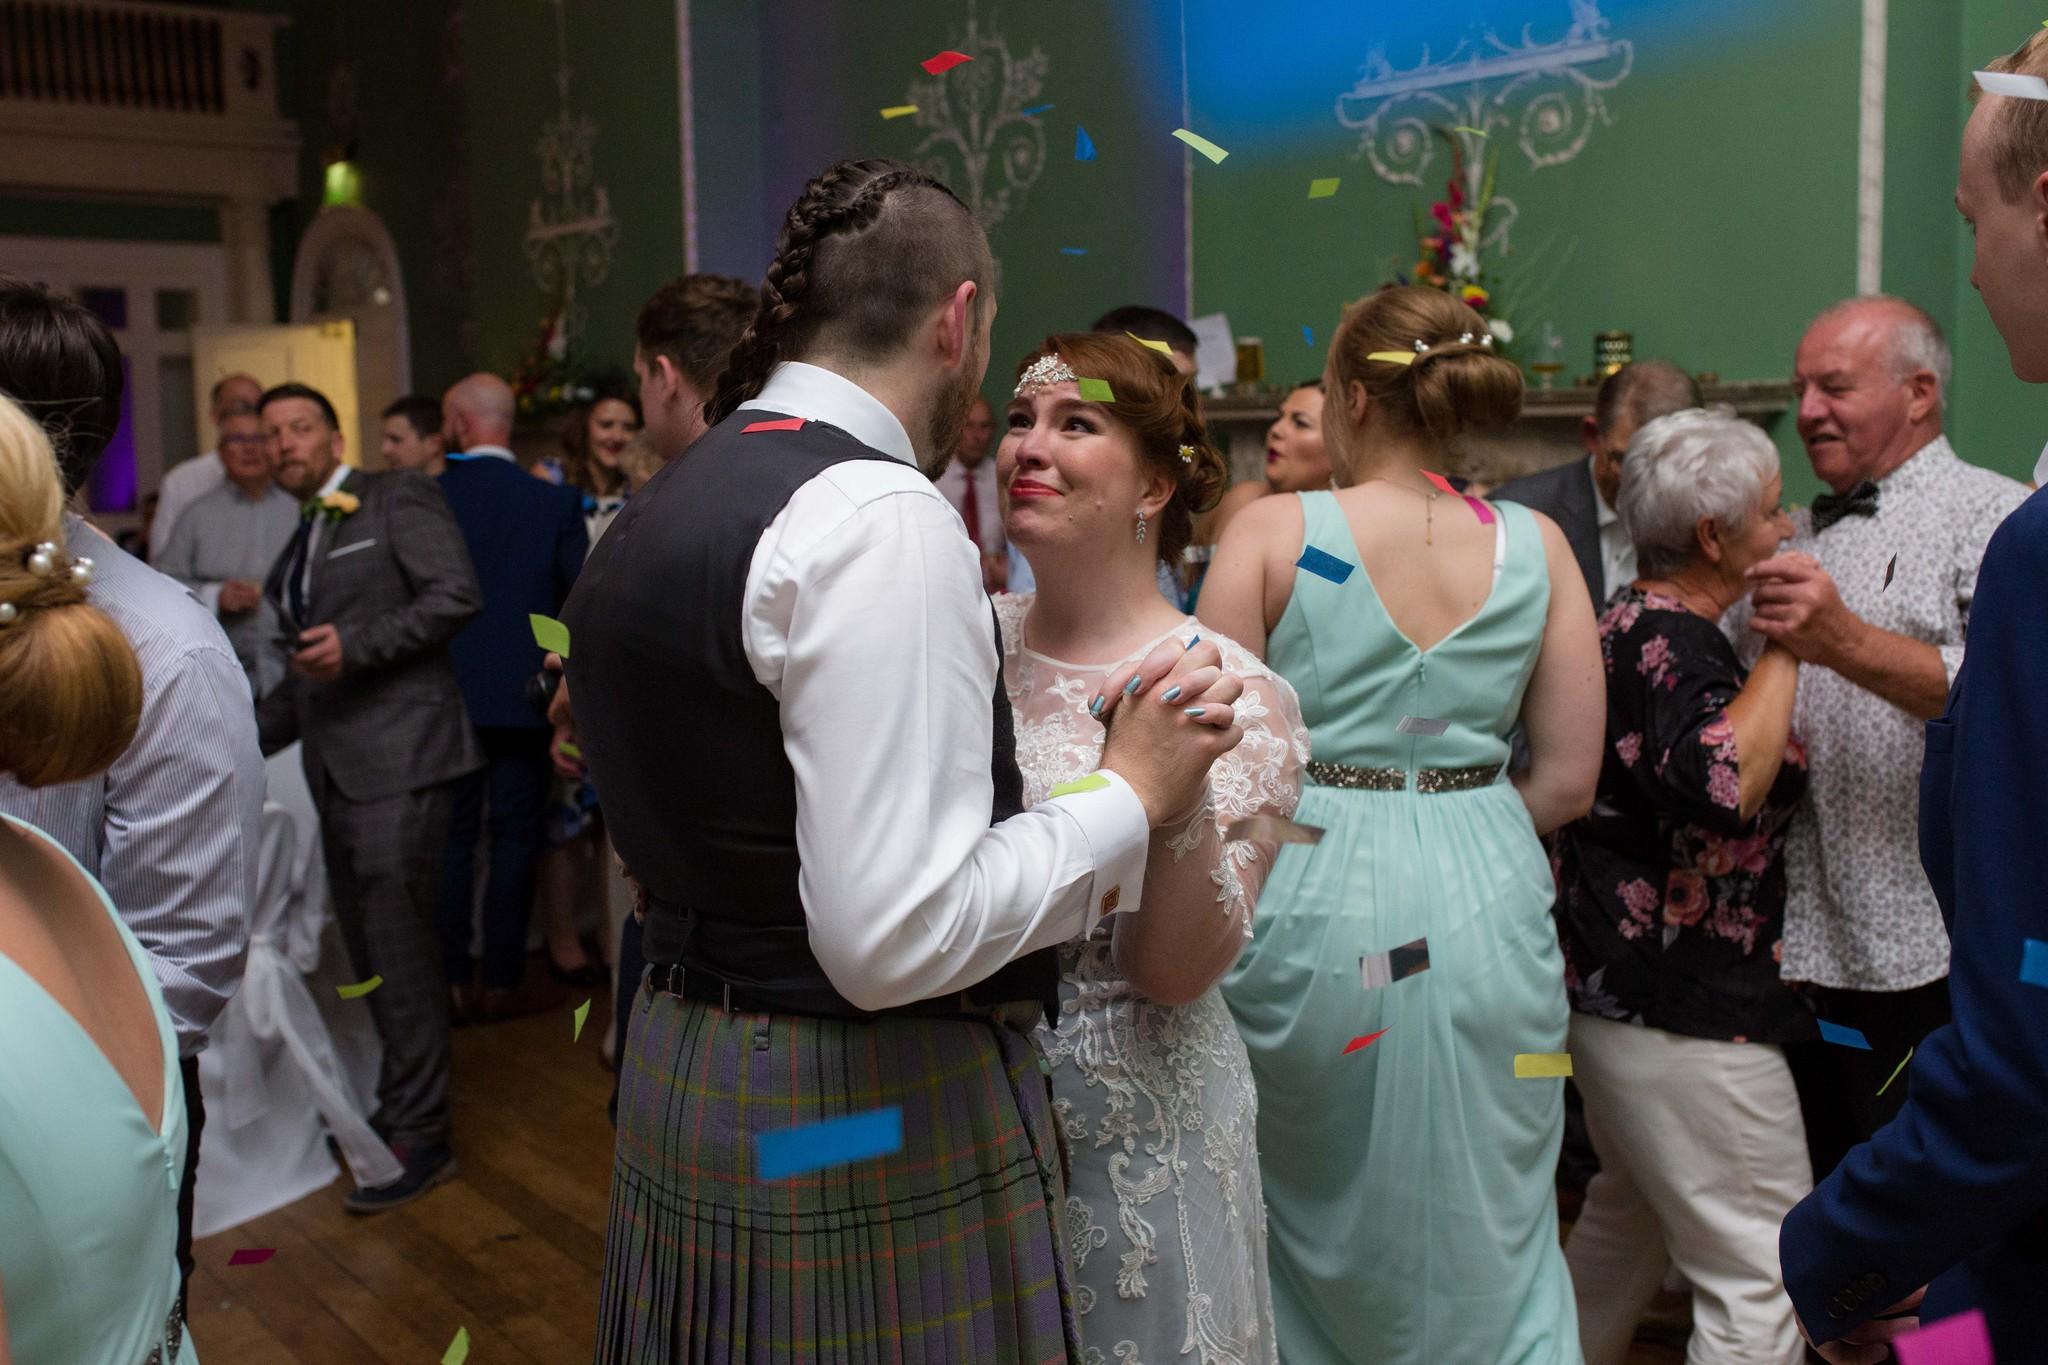 Pimhill Barn summer wedding dance